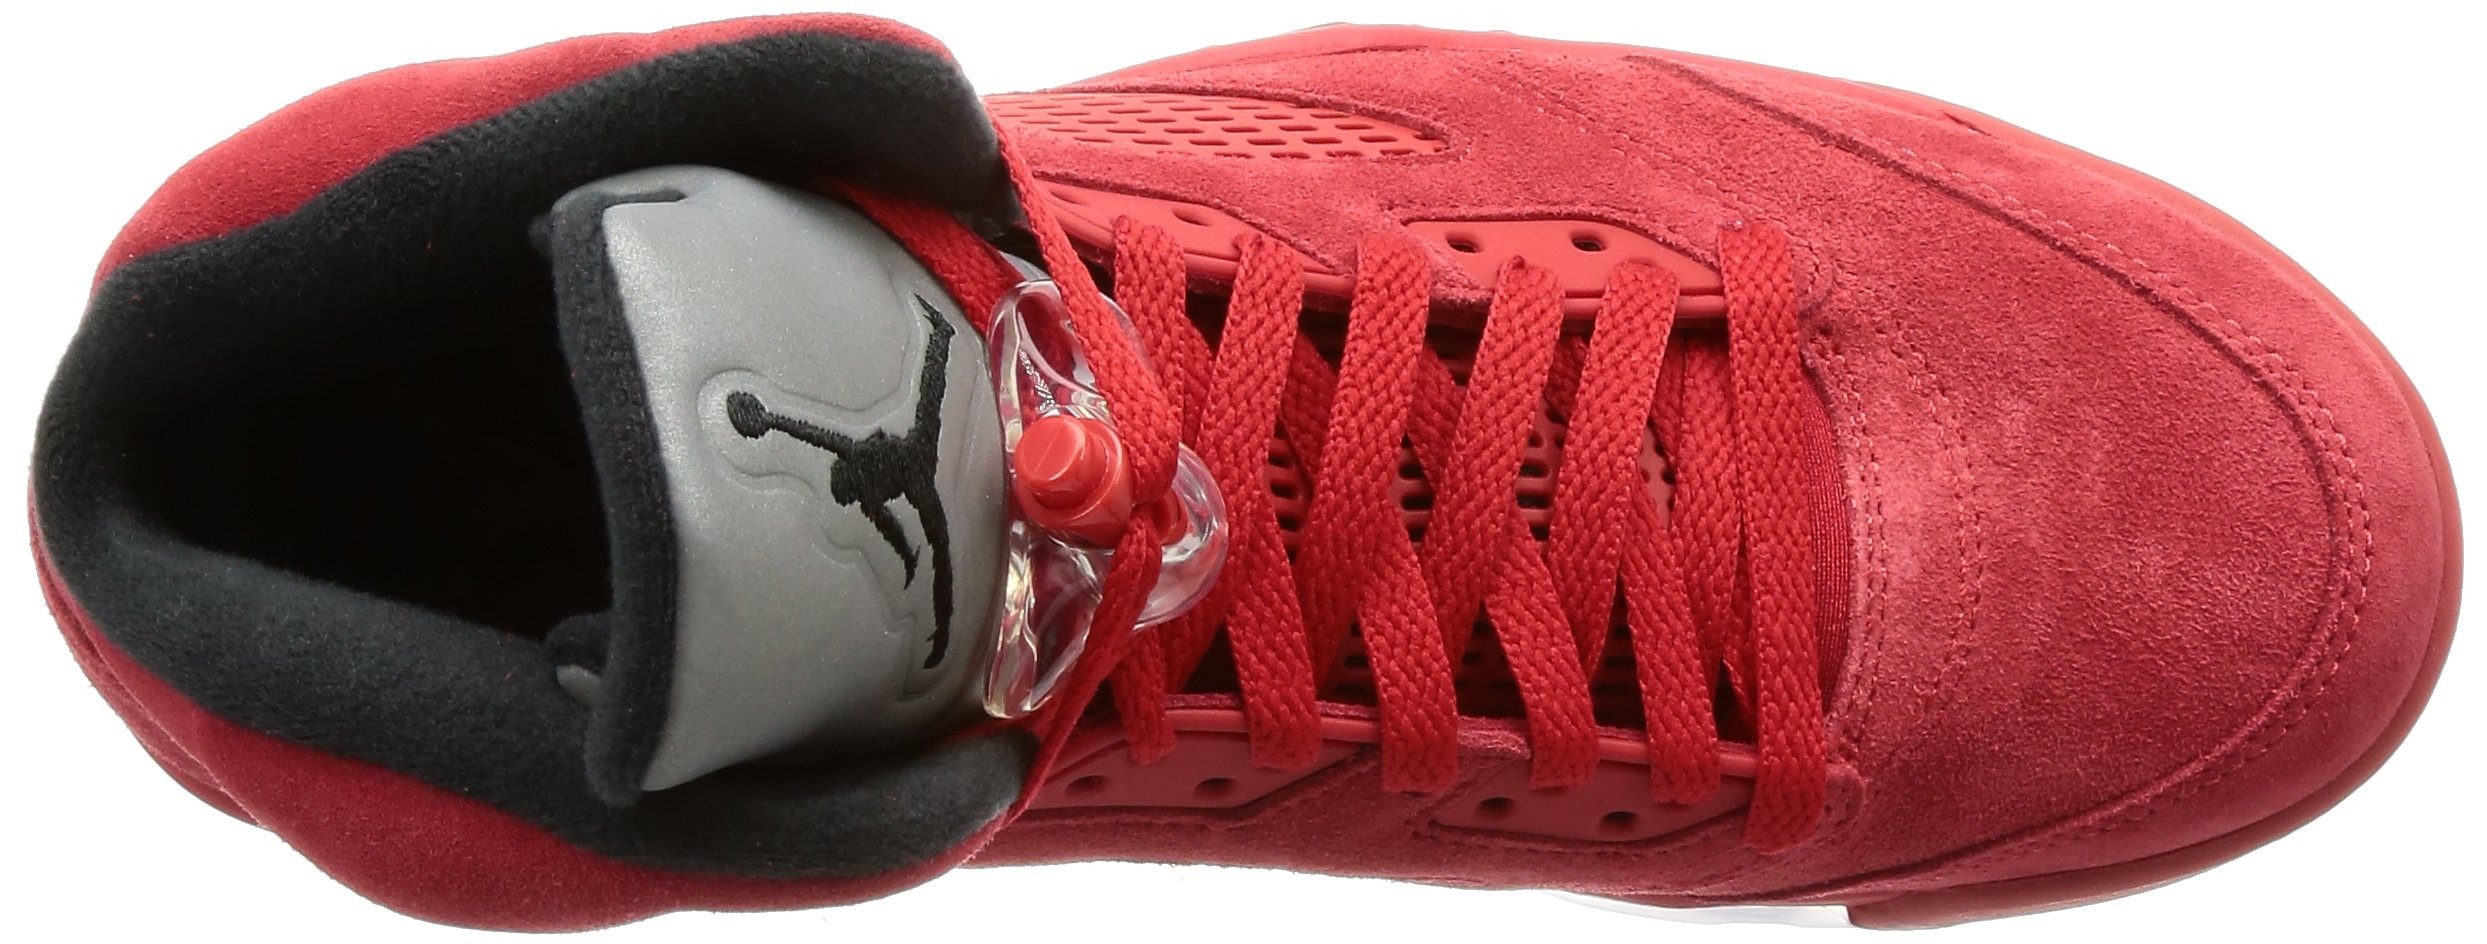 81JrLBgBsNL - Nike Air Jordan 5 Retro 'Red Suede' - 136027-602 - Size 9 -